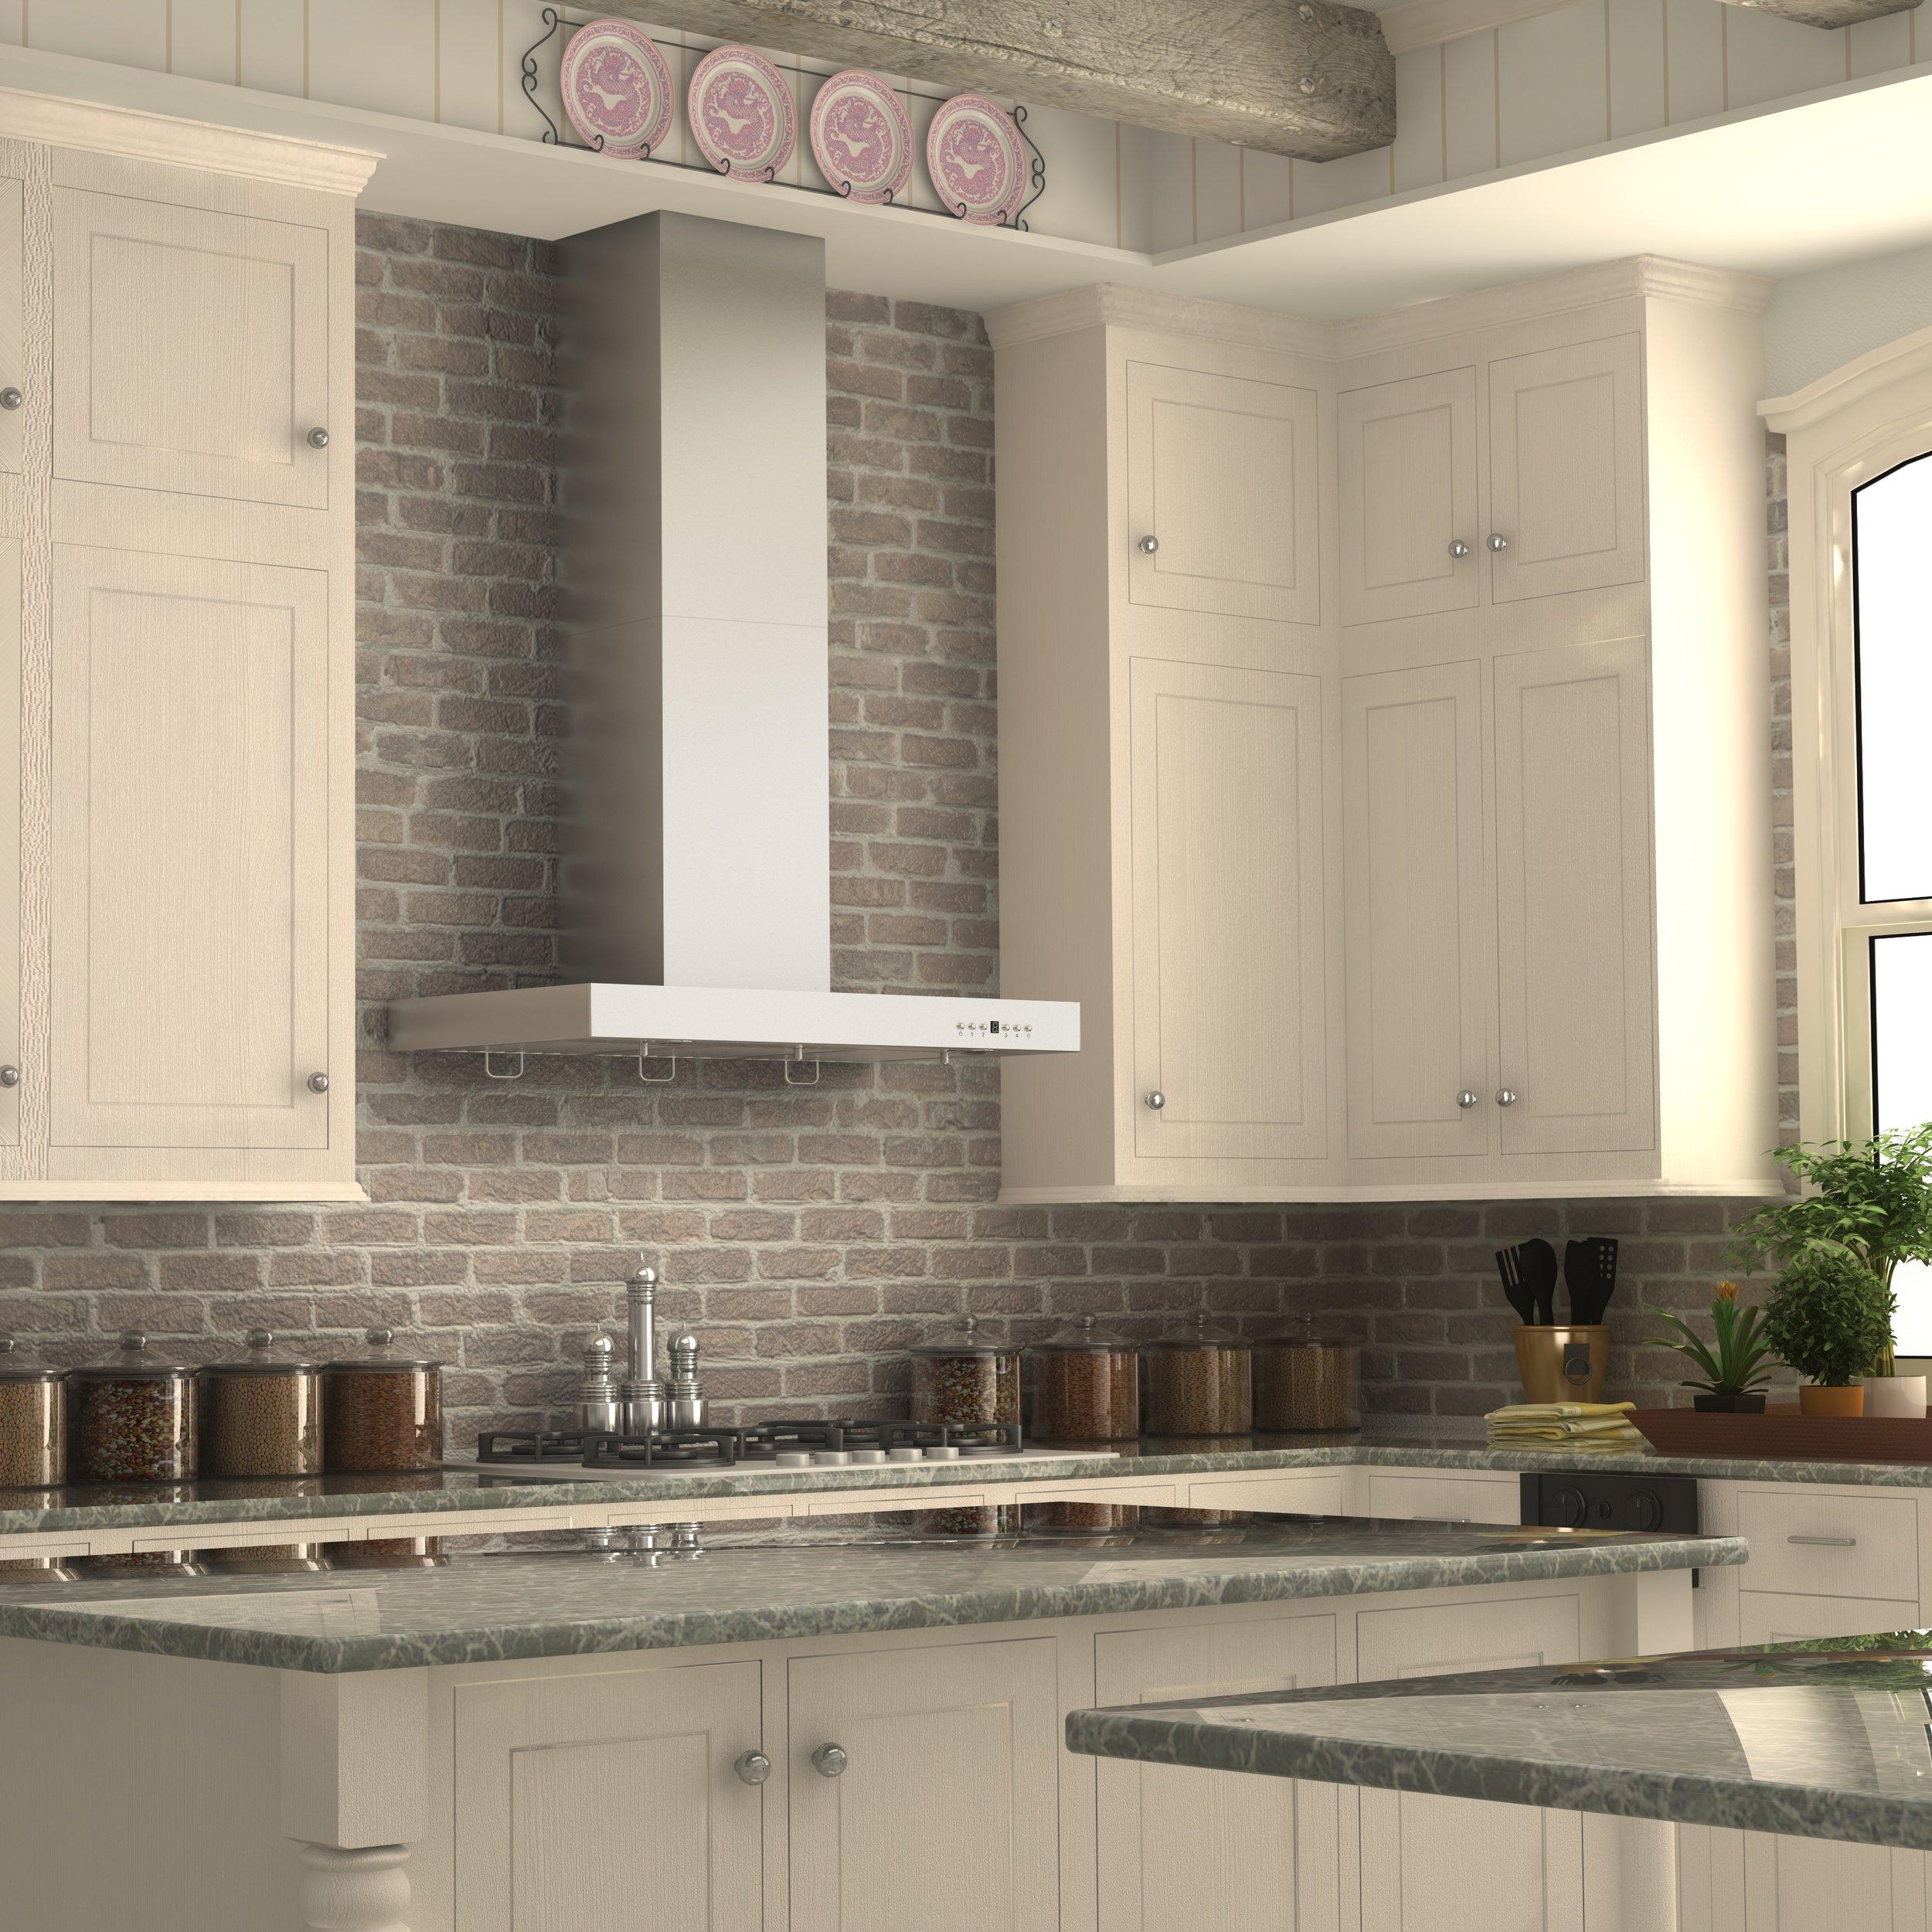 zline-stainless-steel-wall-mounted-range-hood-KE-kitchen.jpeg